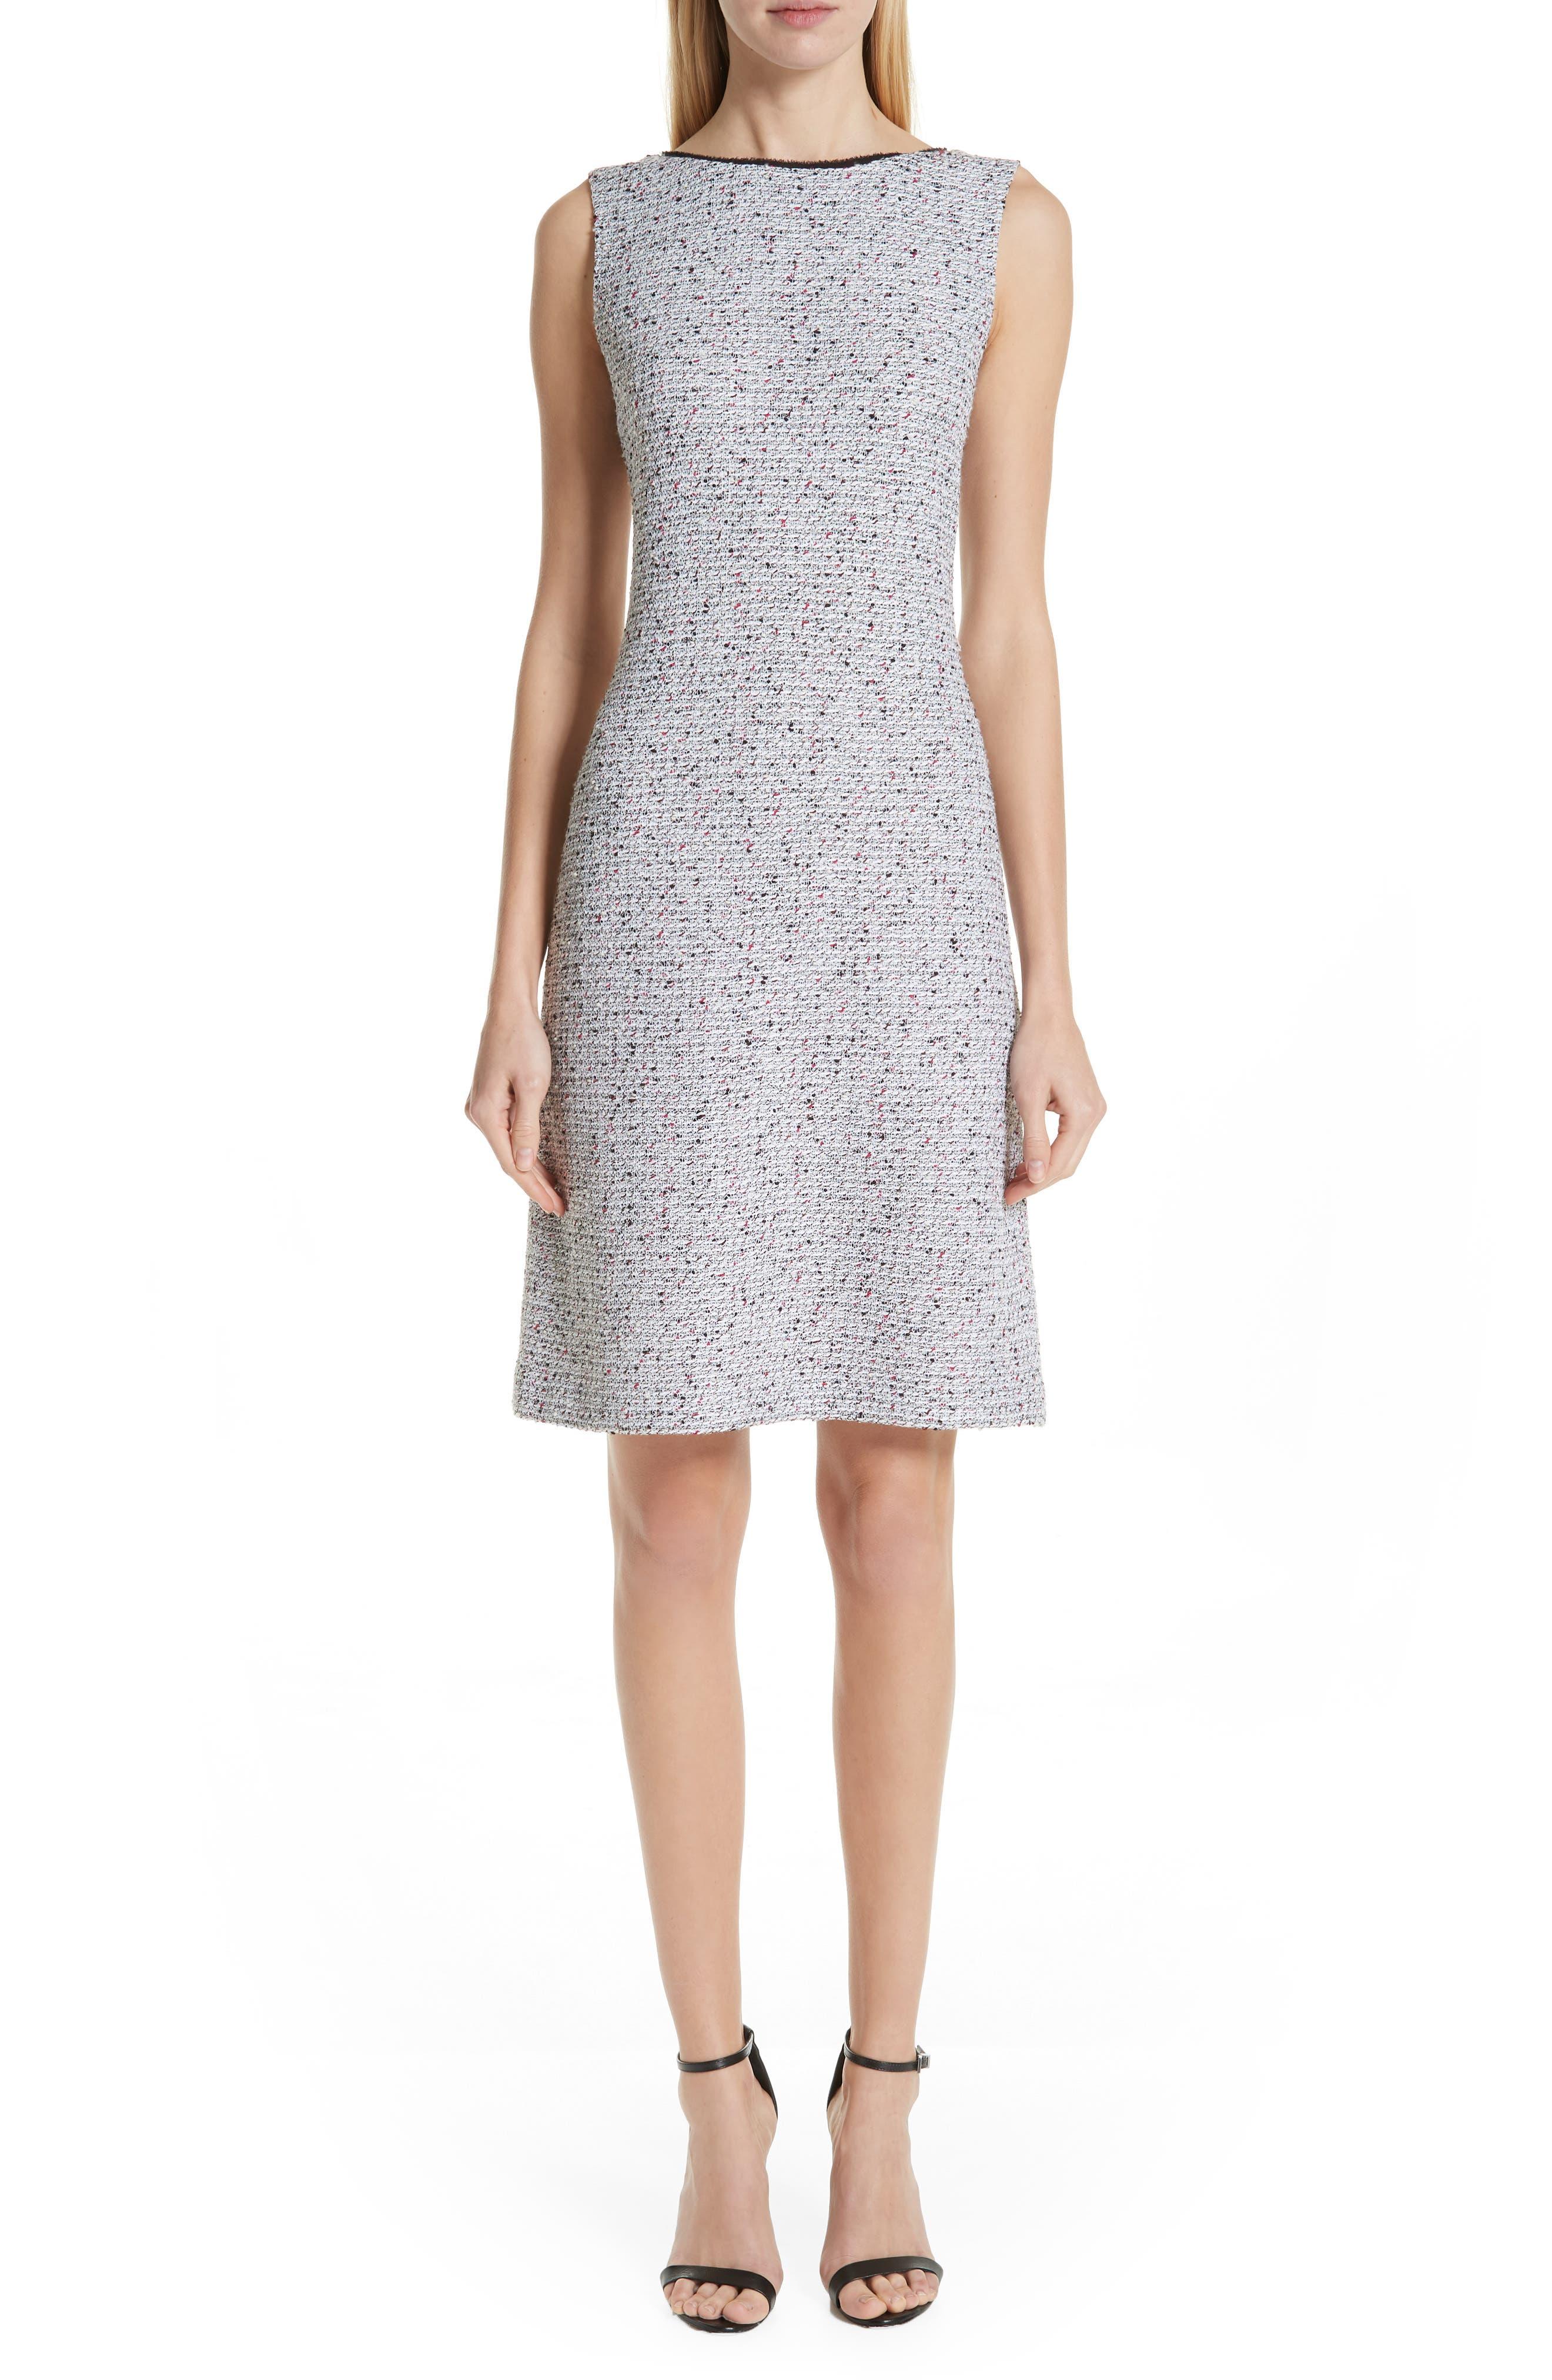 St. John Collection Alicia Knit Sheath Dress, White